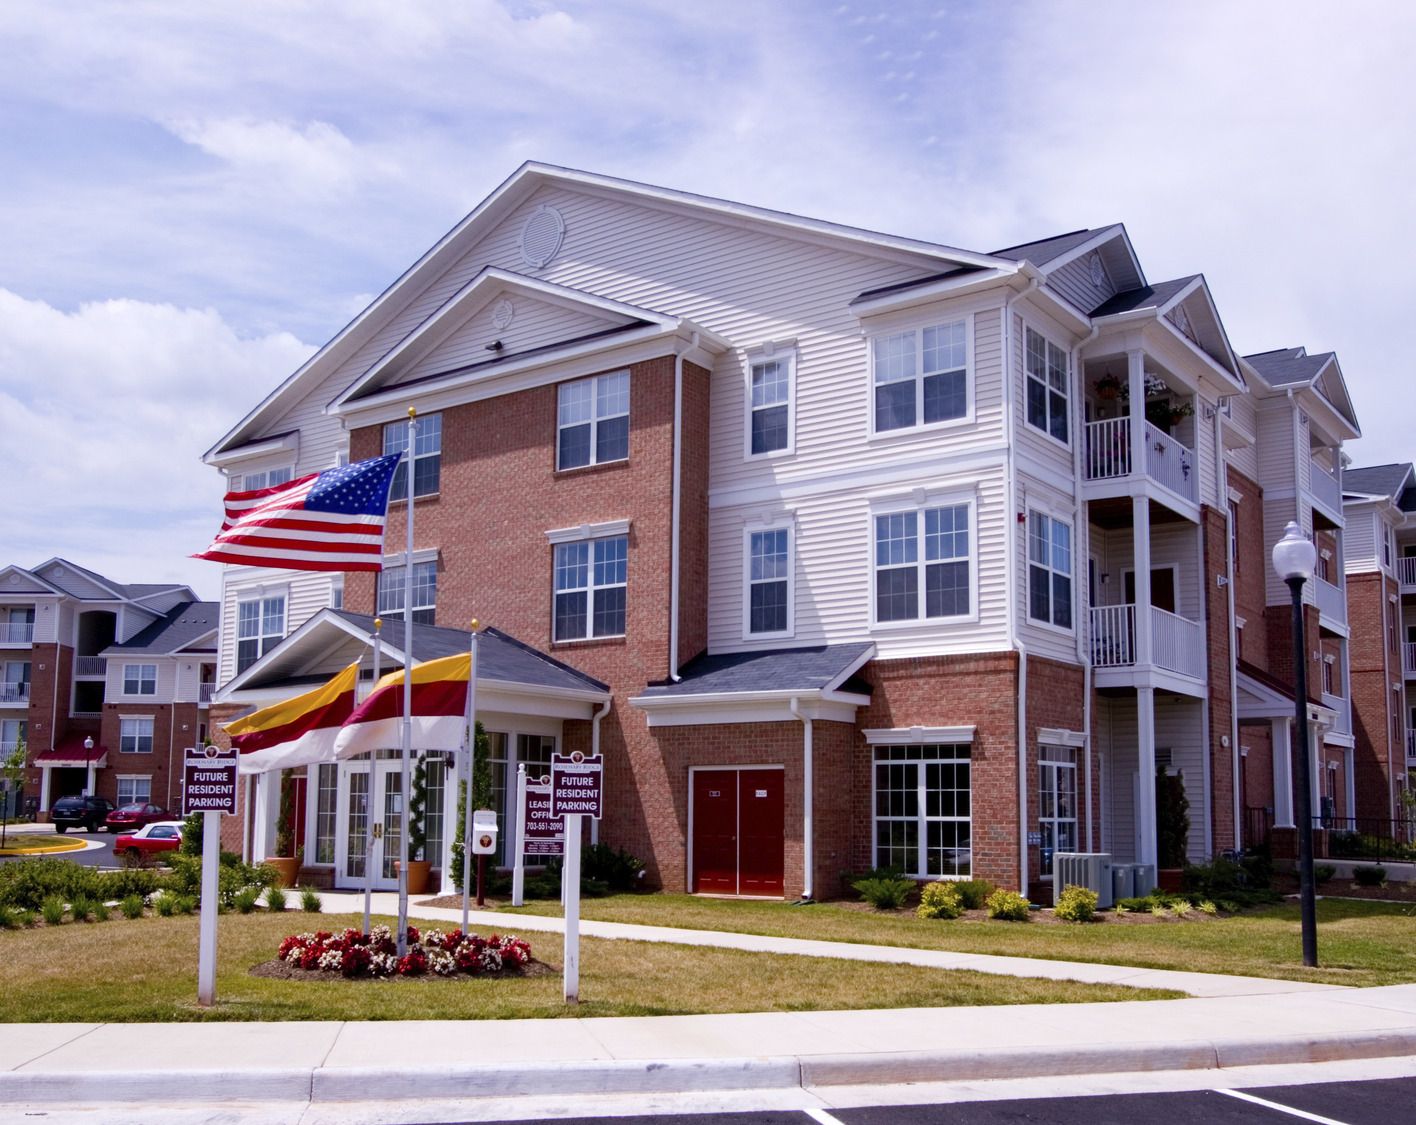 CBG builds Rosemary Ridge Apartments Phase II, a 184 Market-Rate Apartments in Manassas, VA